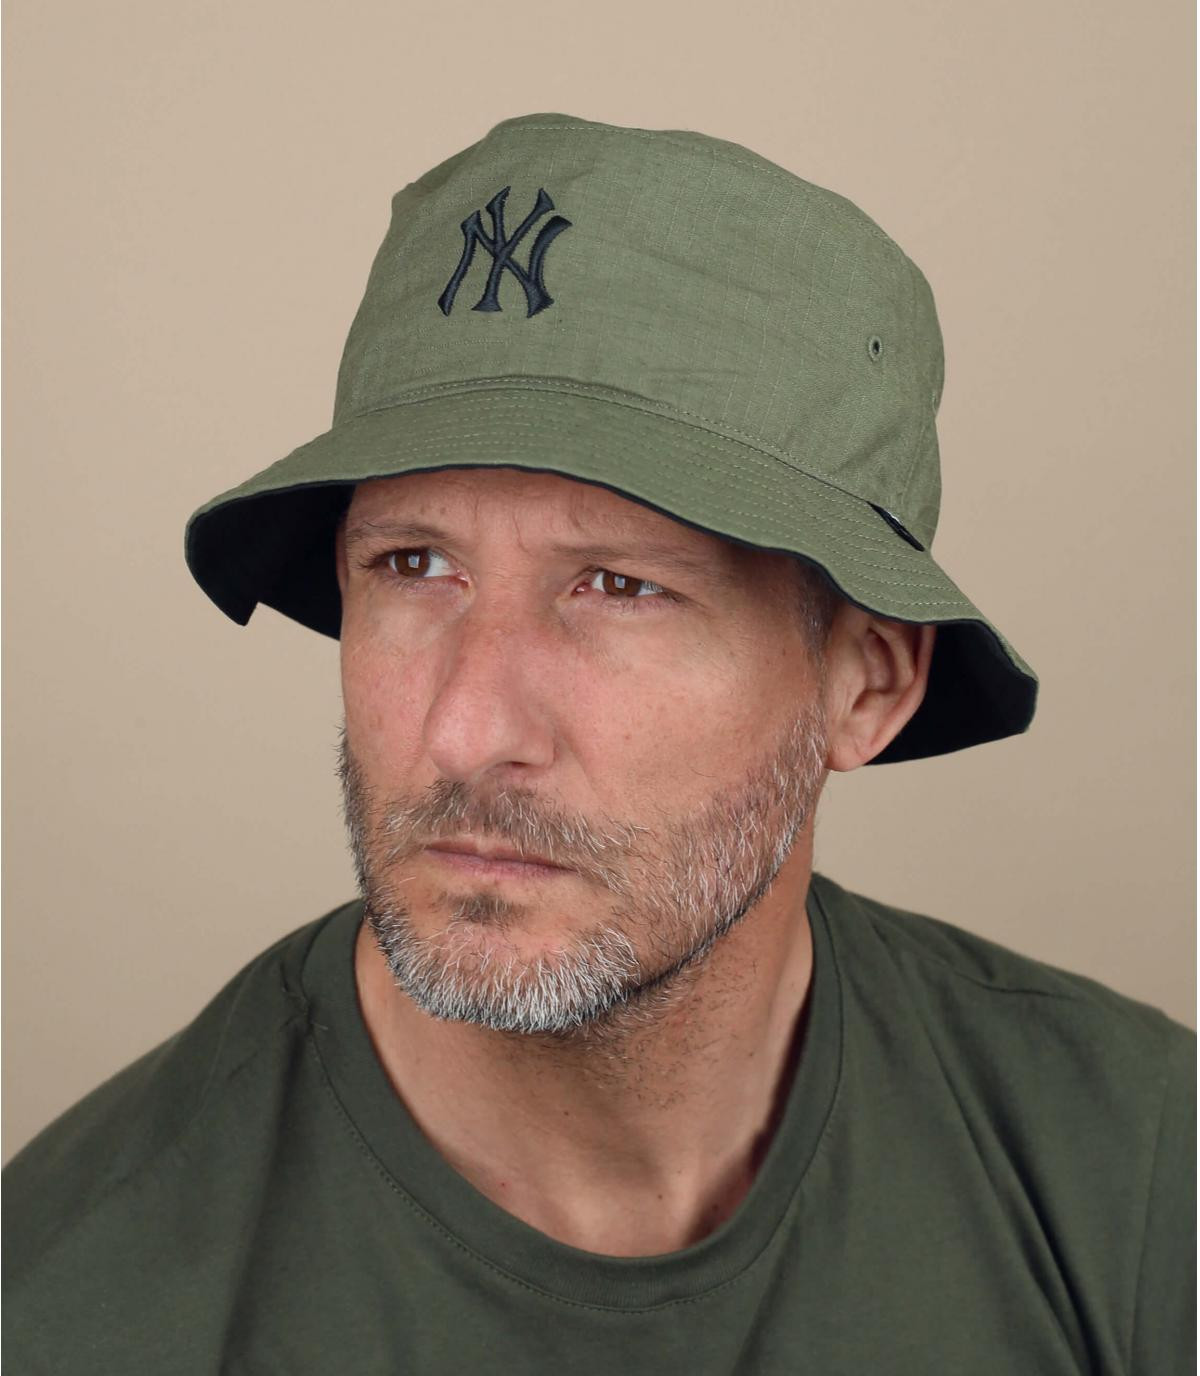 Gorro pescador NY verde